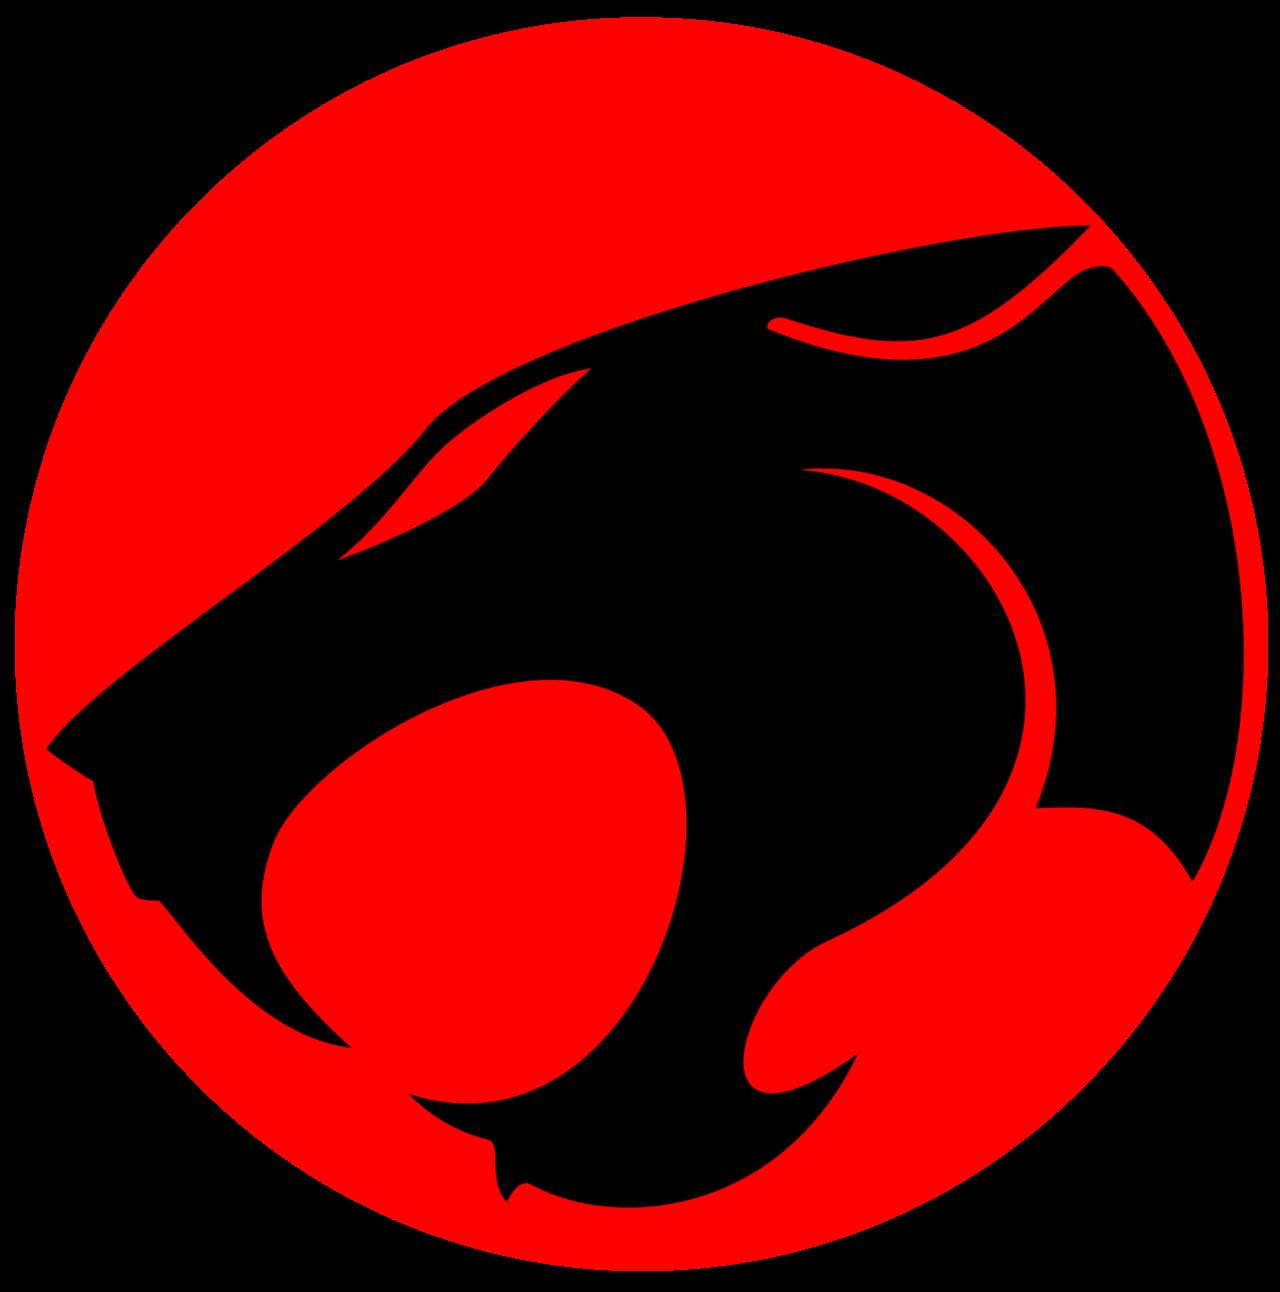 Thundercats Logo Wallpaper 61 Images: Thundercats Logo Wallpaper